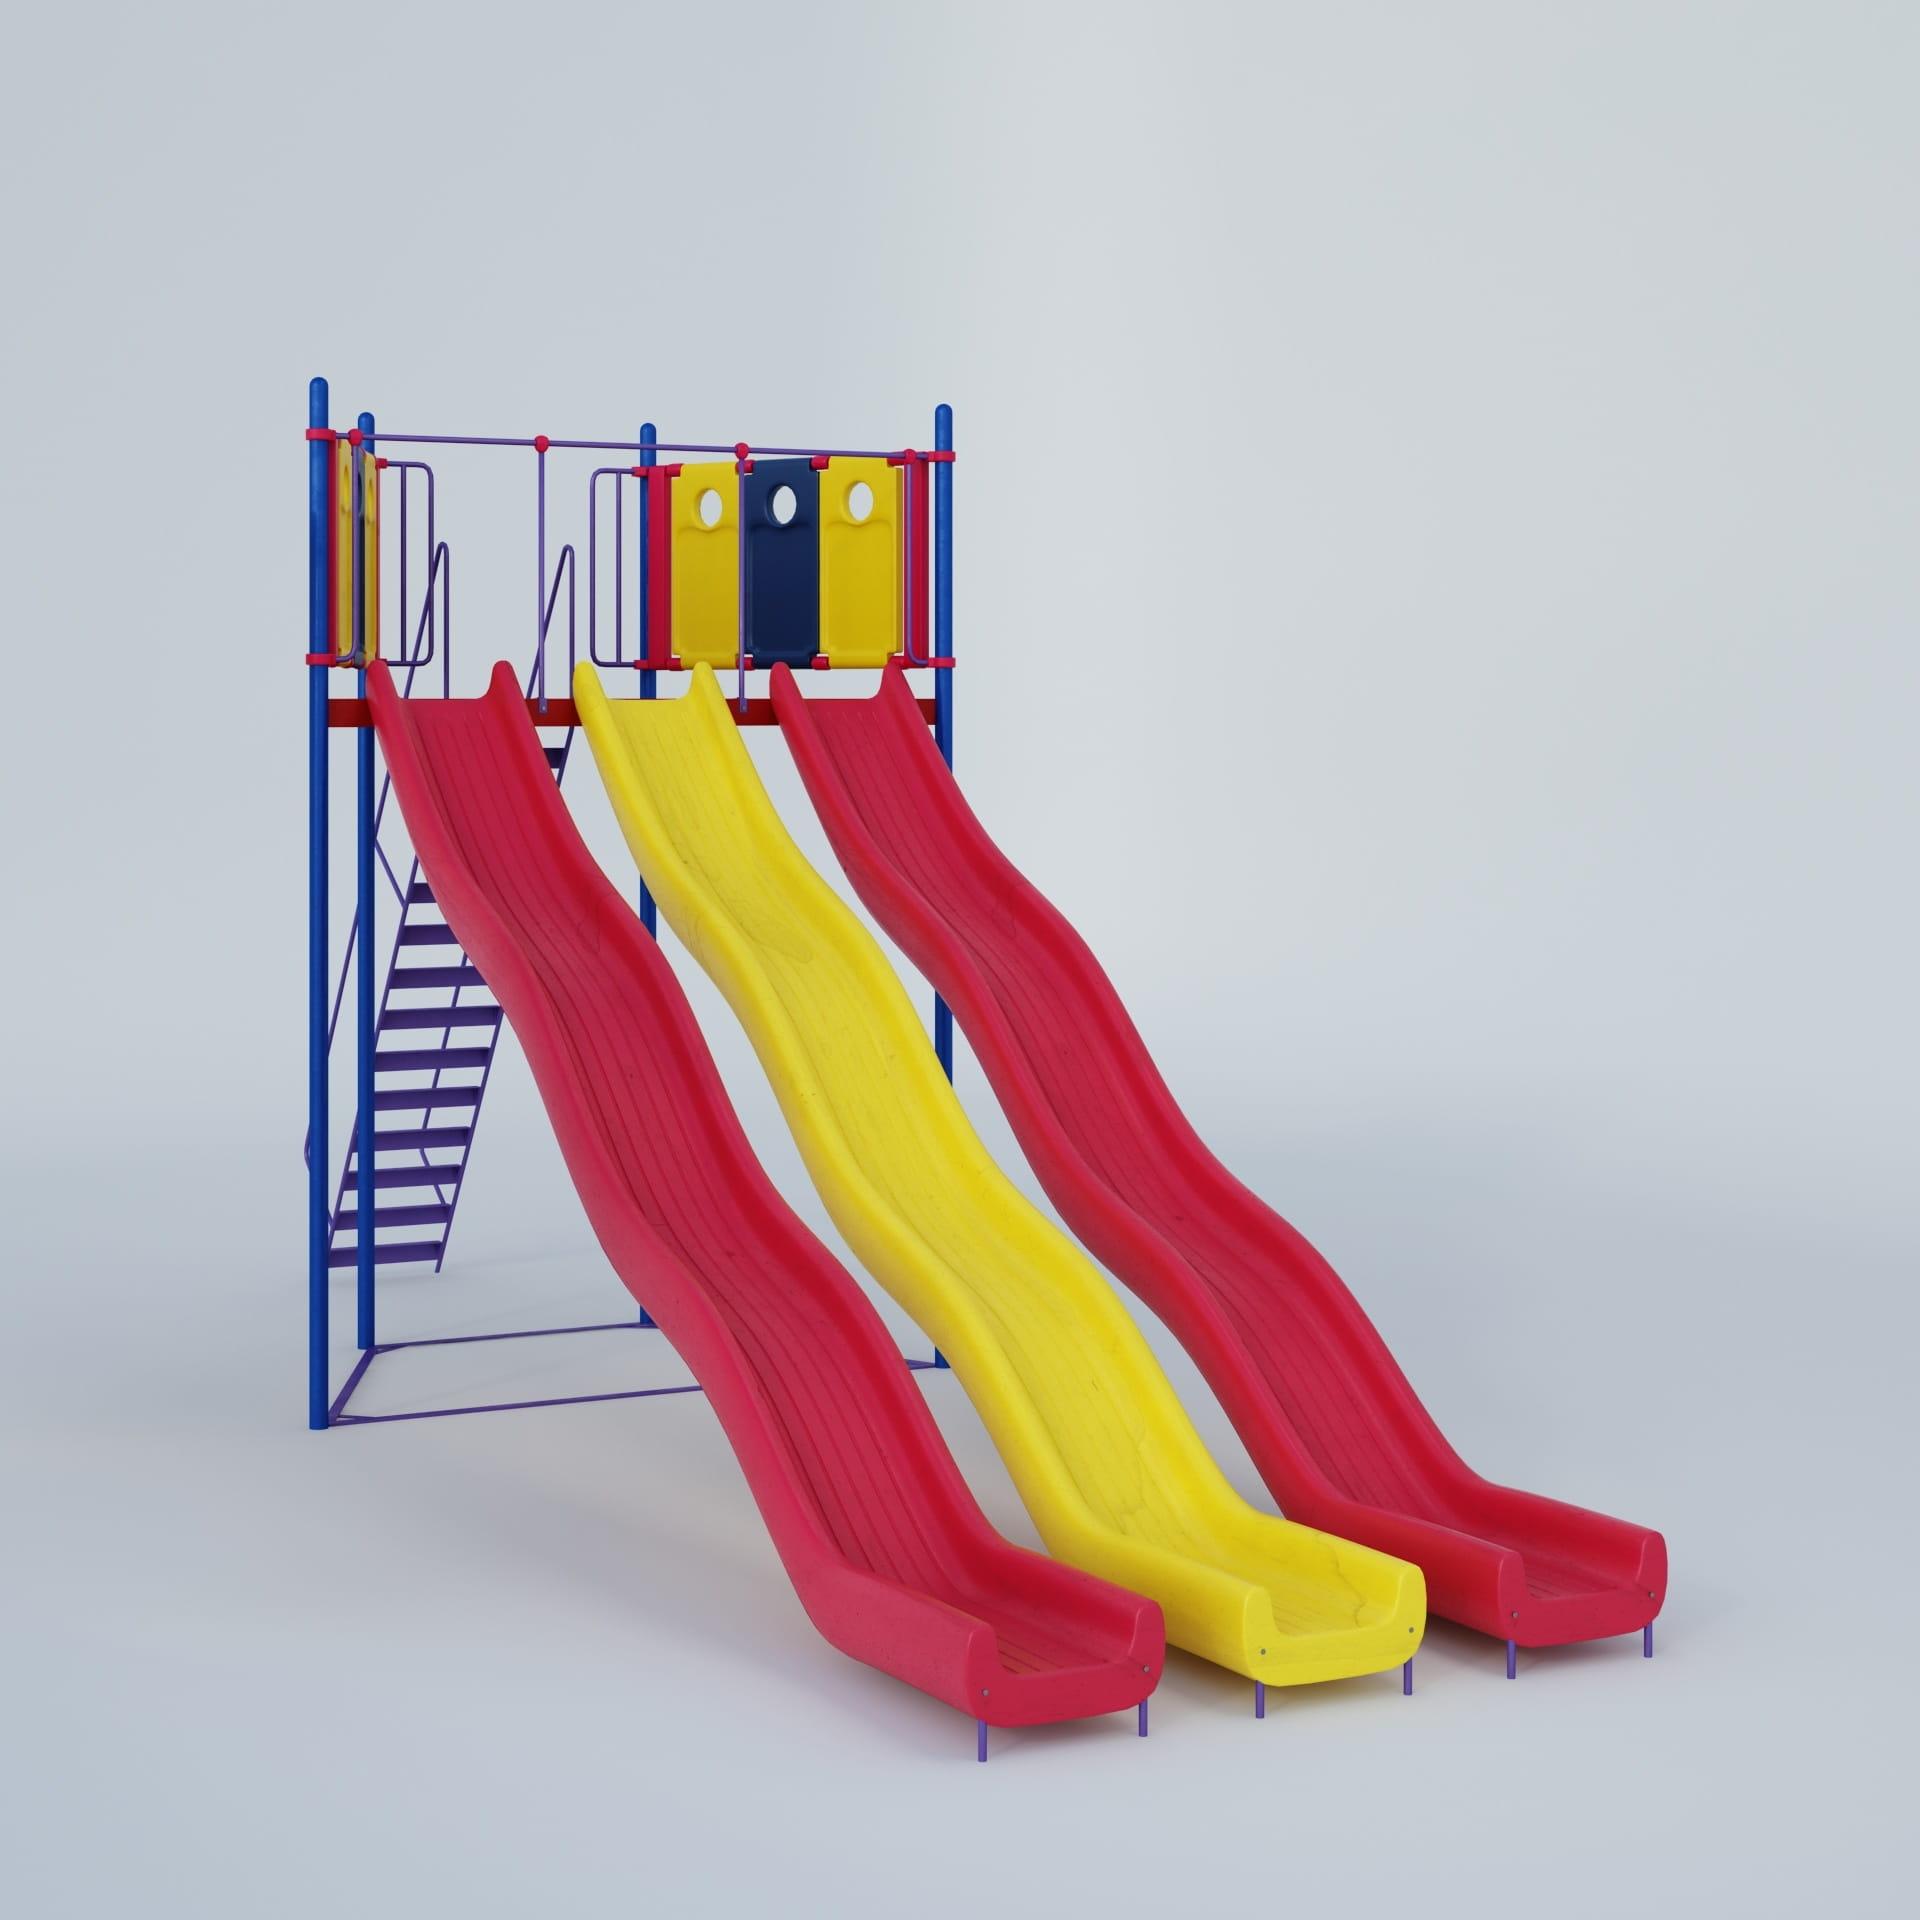 playground equipment 33 AM244 Archmodels